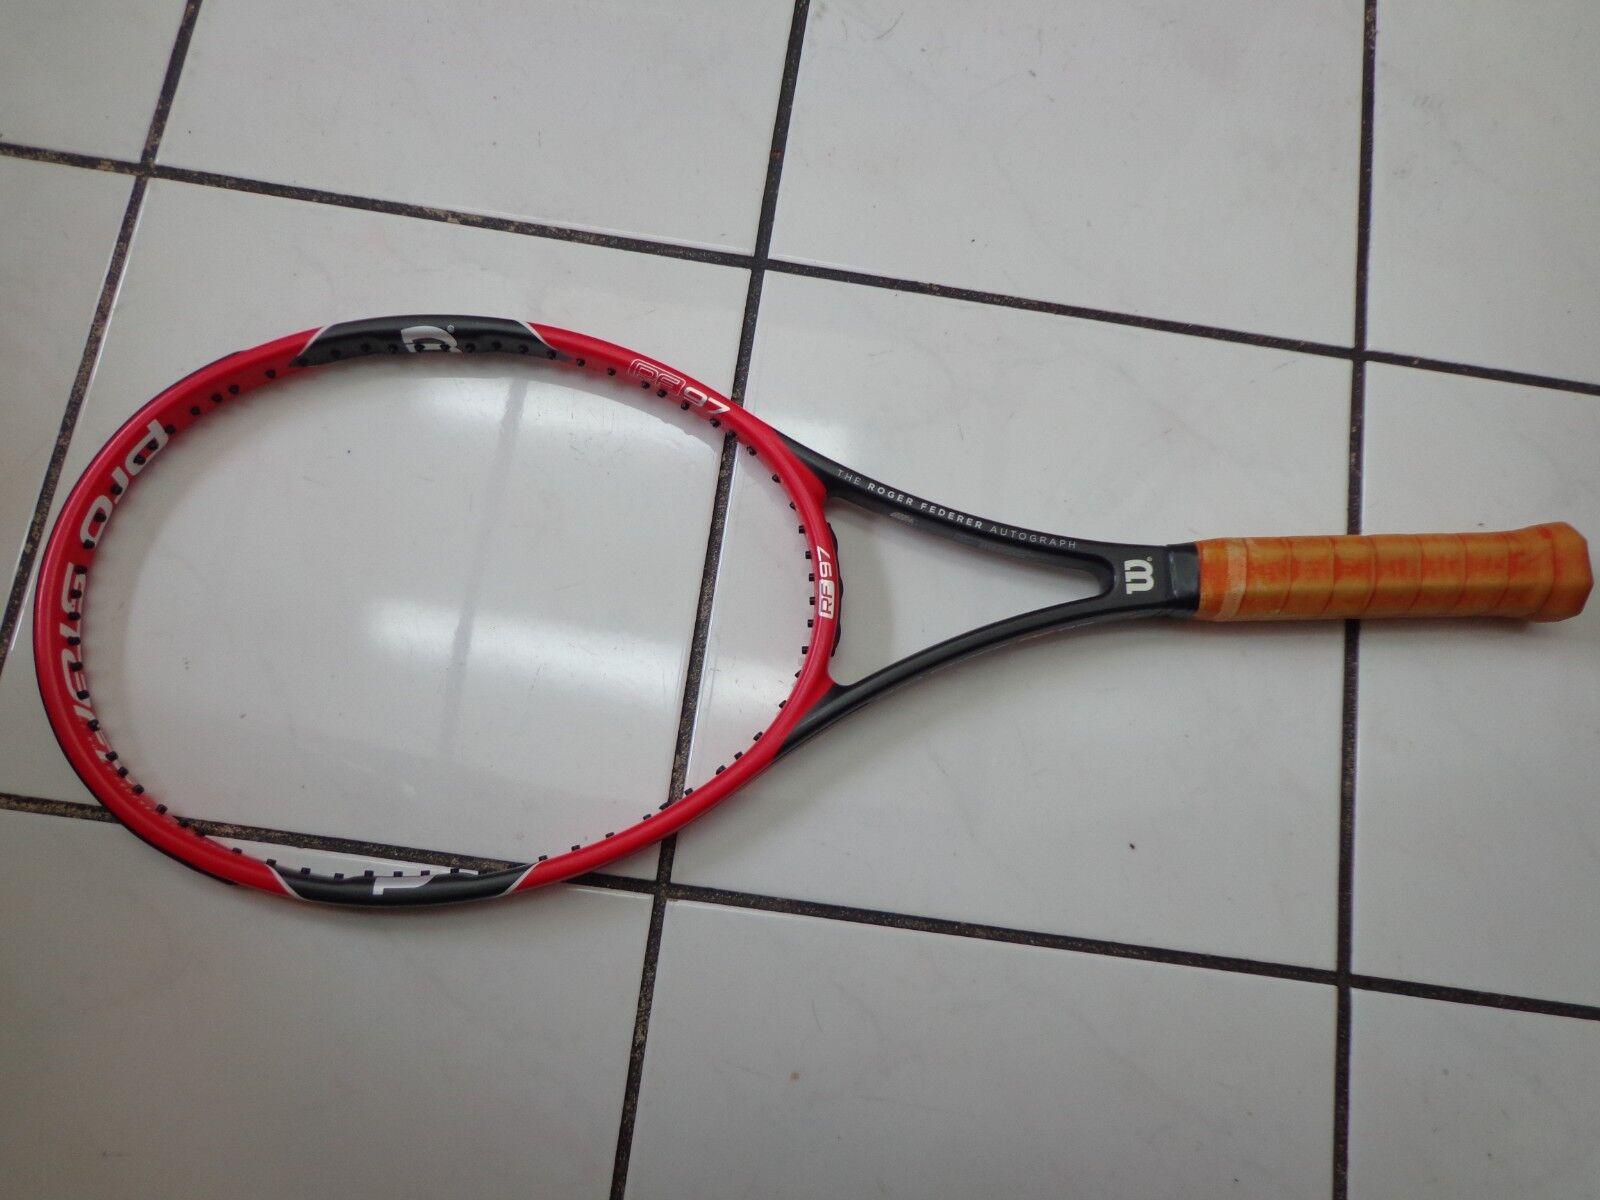 Wilson 2014-16 rf 97  autógrafo Pro Staff Federer 4 1 8 Grip Tenis Raqueta  gran descuento